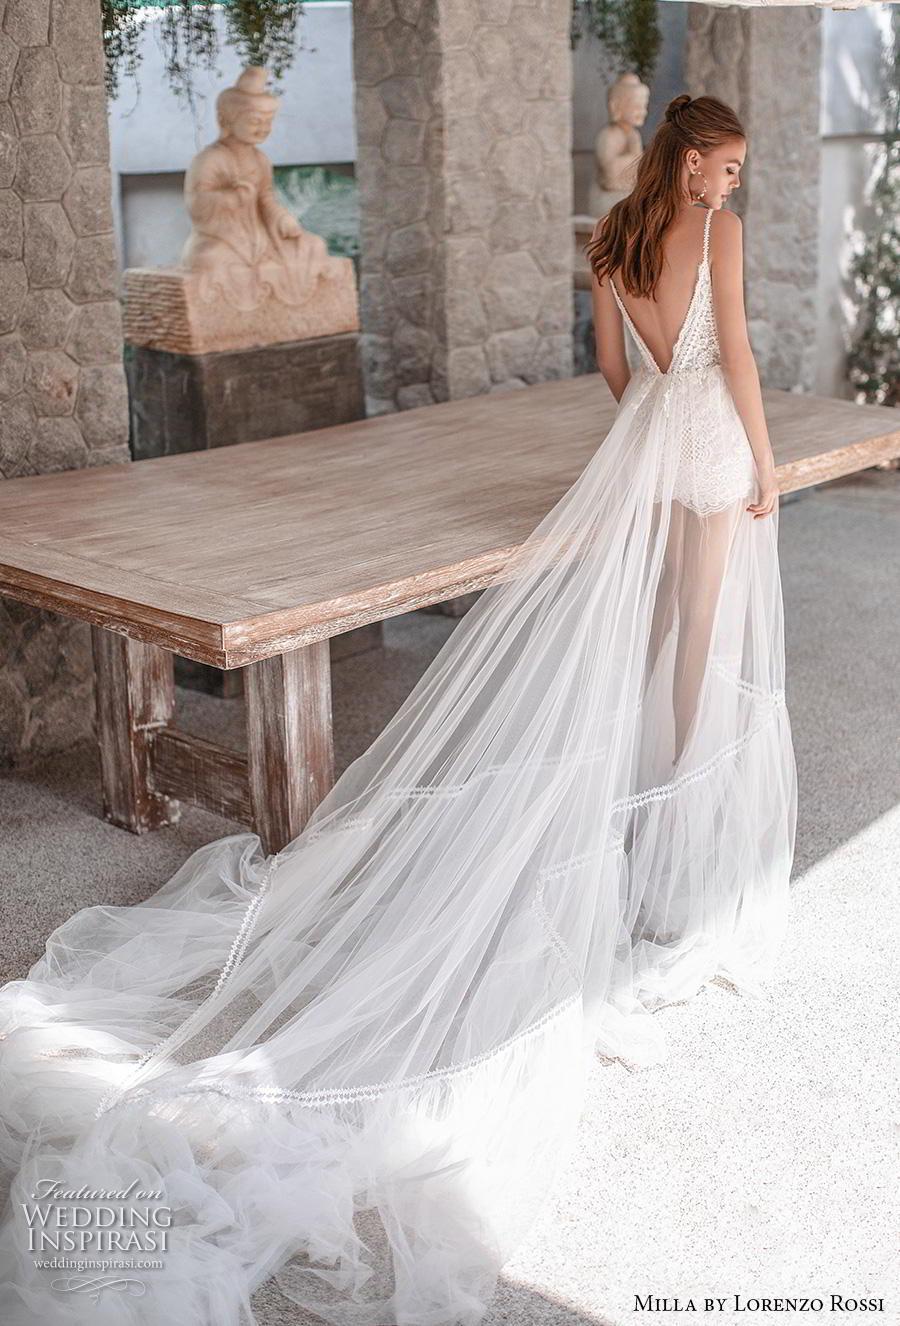 lorenzo rossi 2019 milla bridal sleeveless spaghetti strap deep diamond neckline heavily embellished bodice sheer skirt romantic soft a  line wedding dress low v back chapel train (13) bv